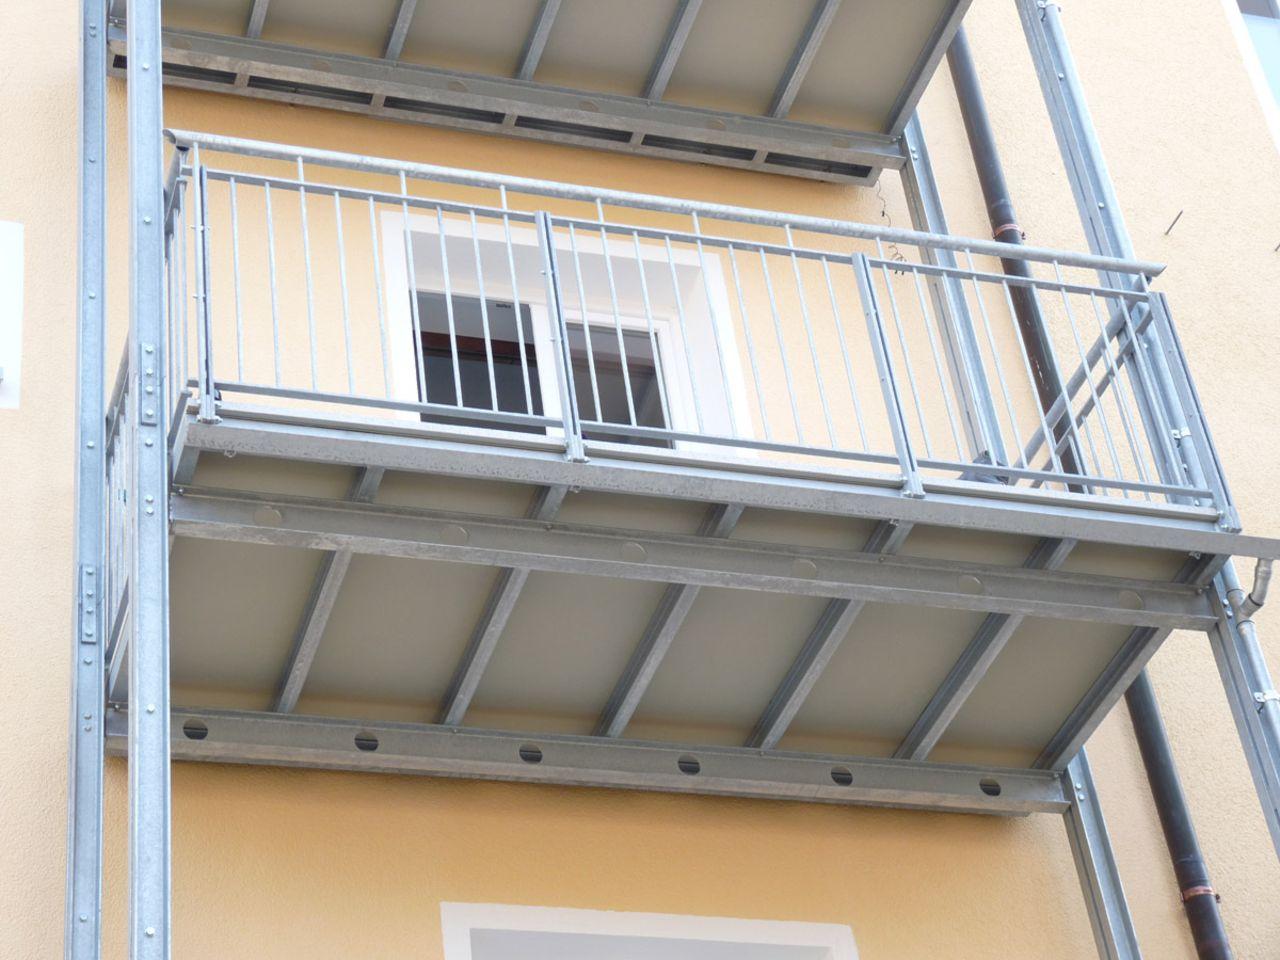 vogt balkon partner f r nachtr glichen balkonanbau in m nchen vogt balkone im fokus. Black Bedroom Furniture Sets. Home Design Ideas